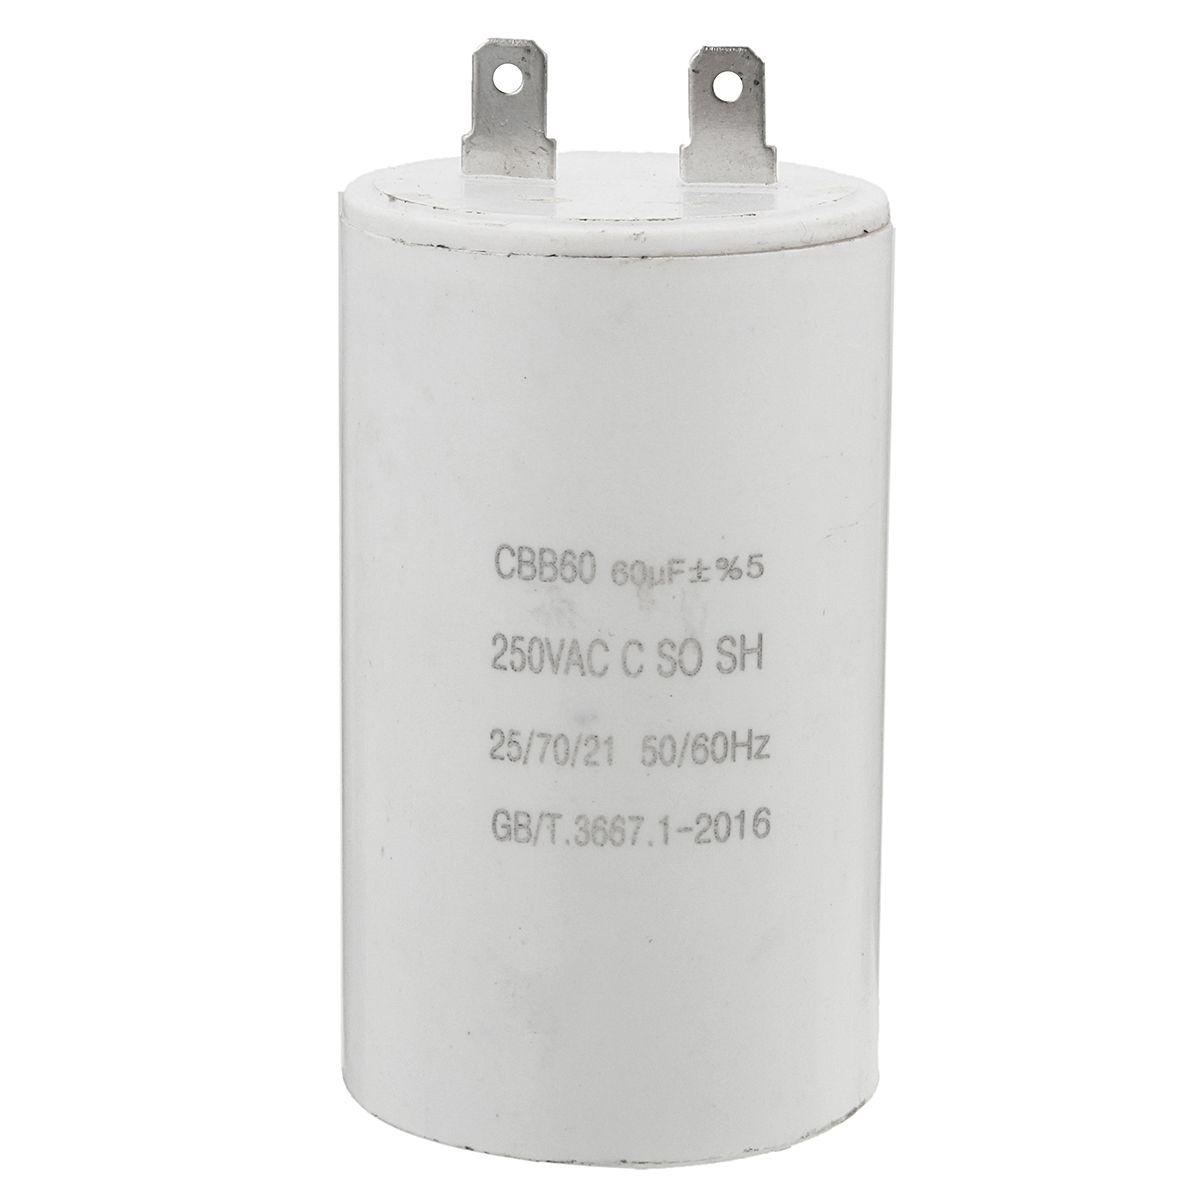 250vac 60uf Cbb60 Capacitor For Karcher Power Pressure Washer 50 60hz White Diy Kits Washer Pressure Washer